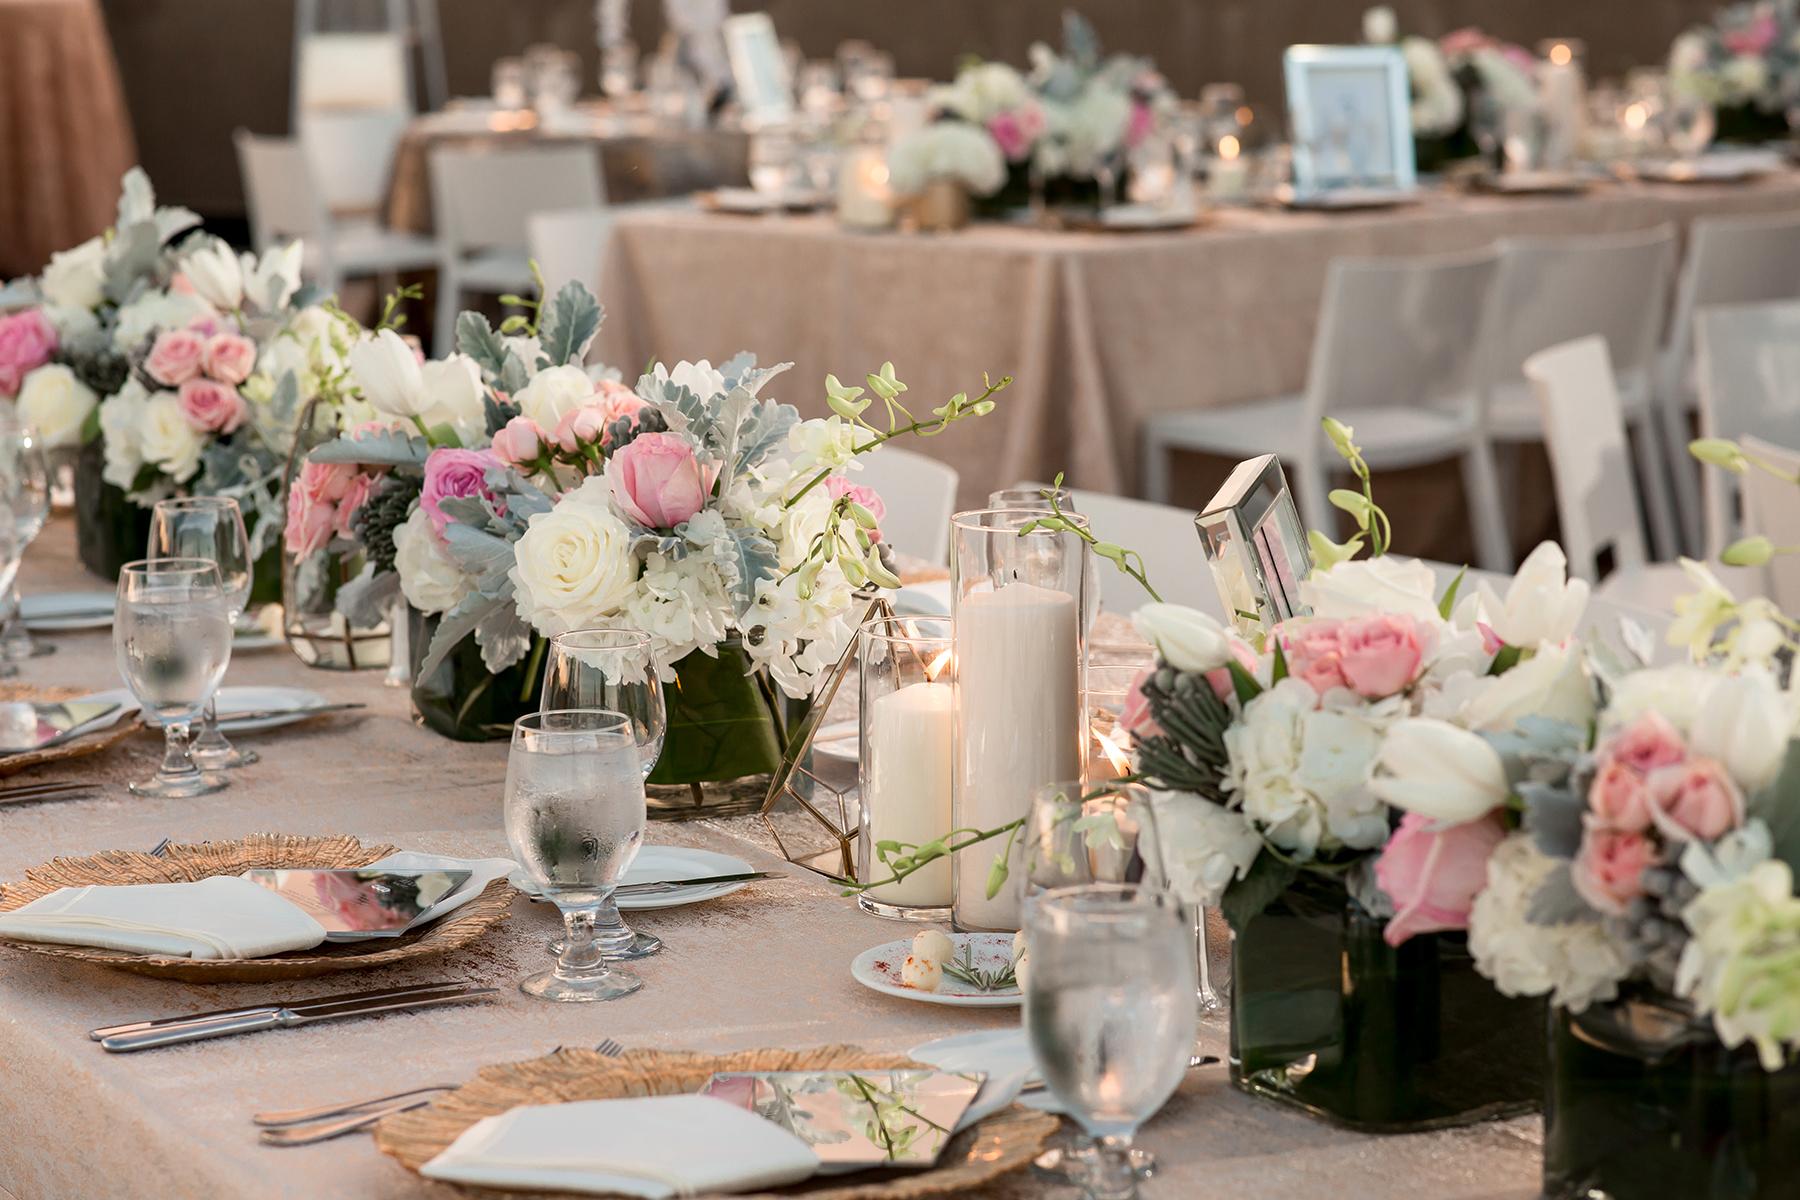 daytoremember.net | Talitha Tarro Photography | El Dorado Hotel & Spa | Santa Fe, New Mexico | A Day To Remember Houston Luxury Wedding Planning and Design